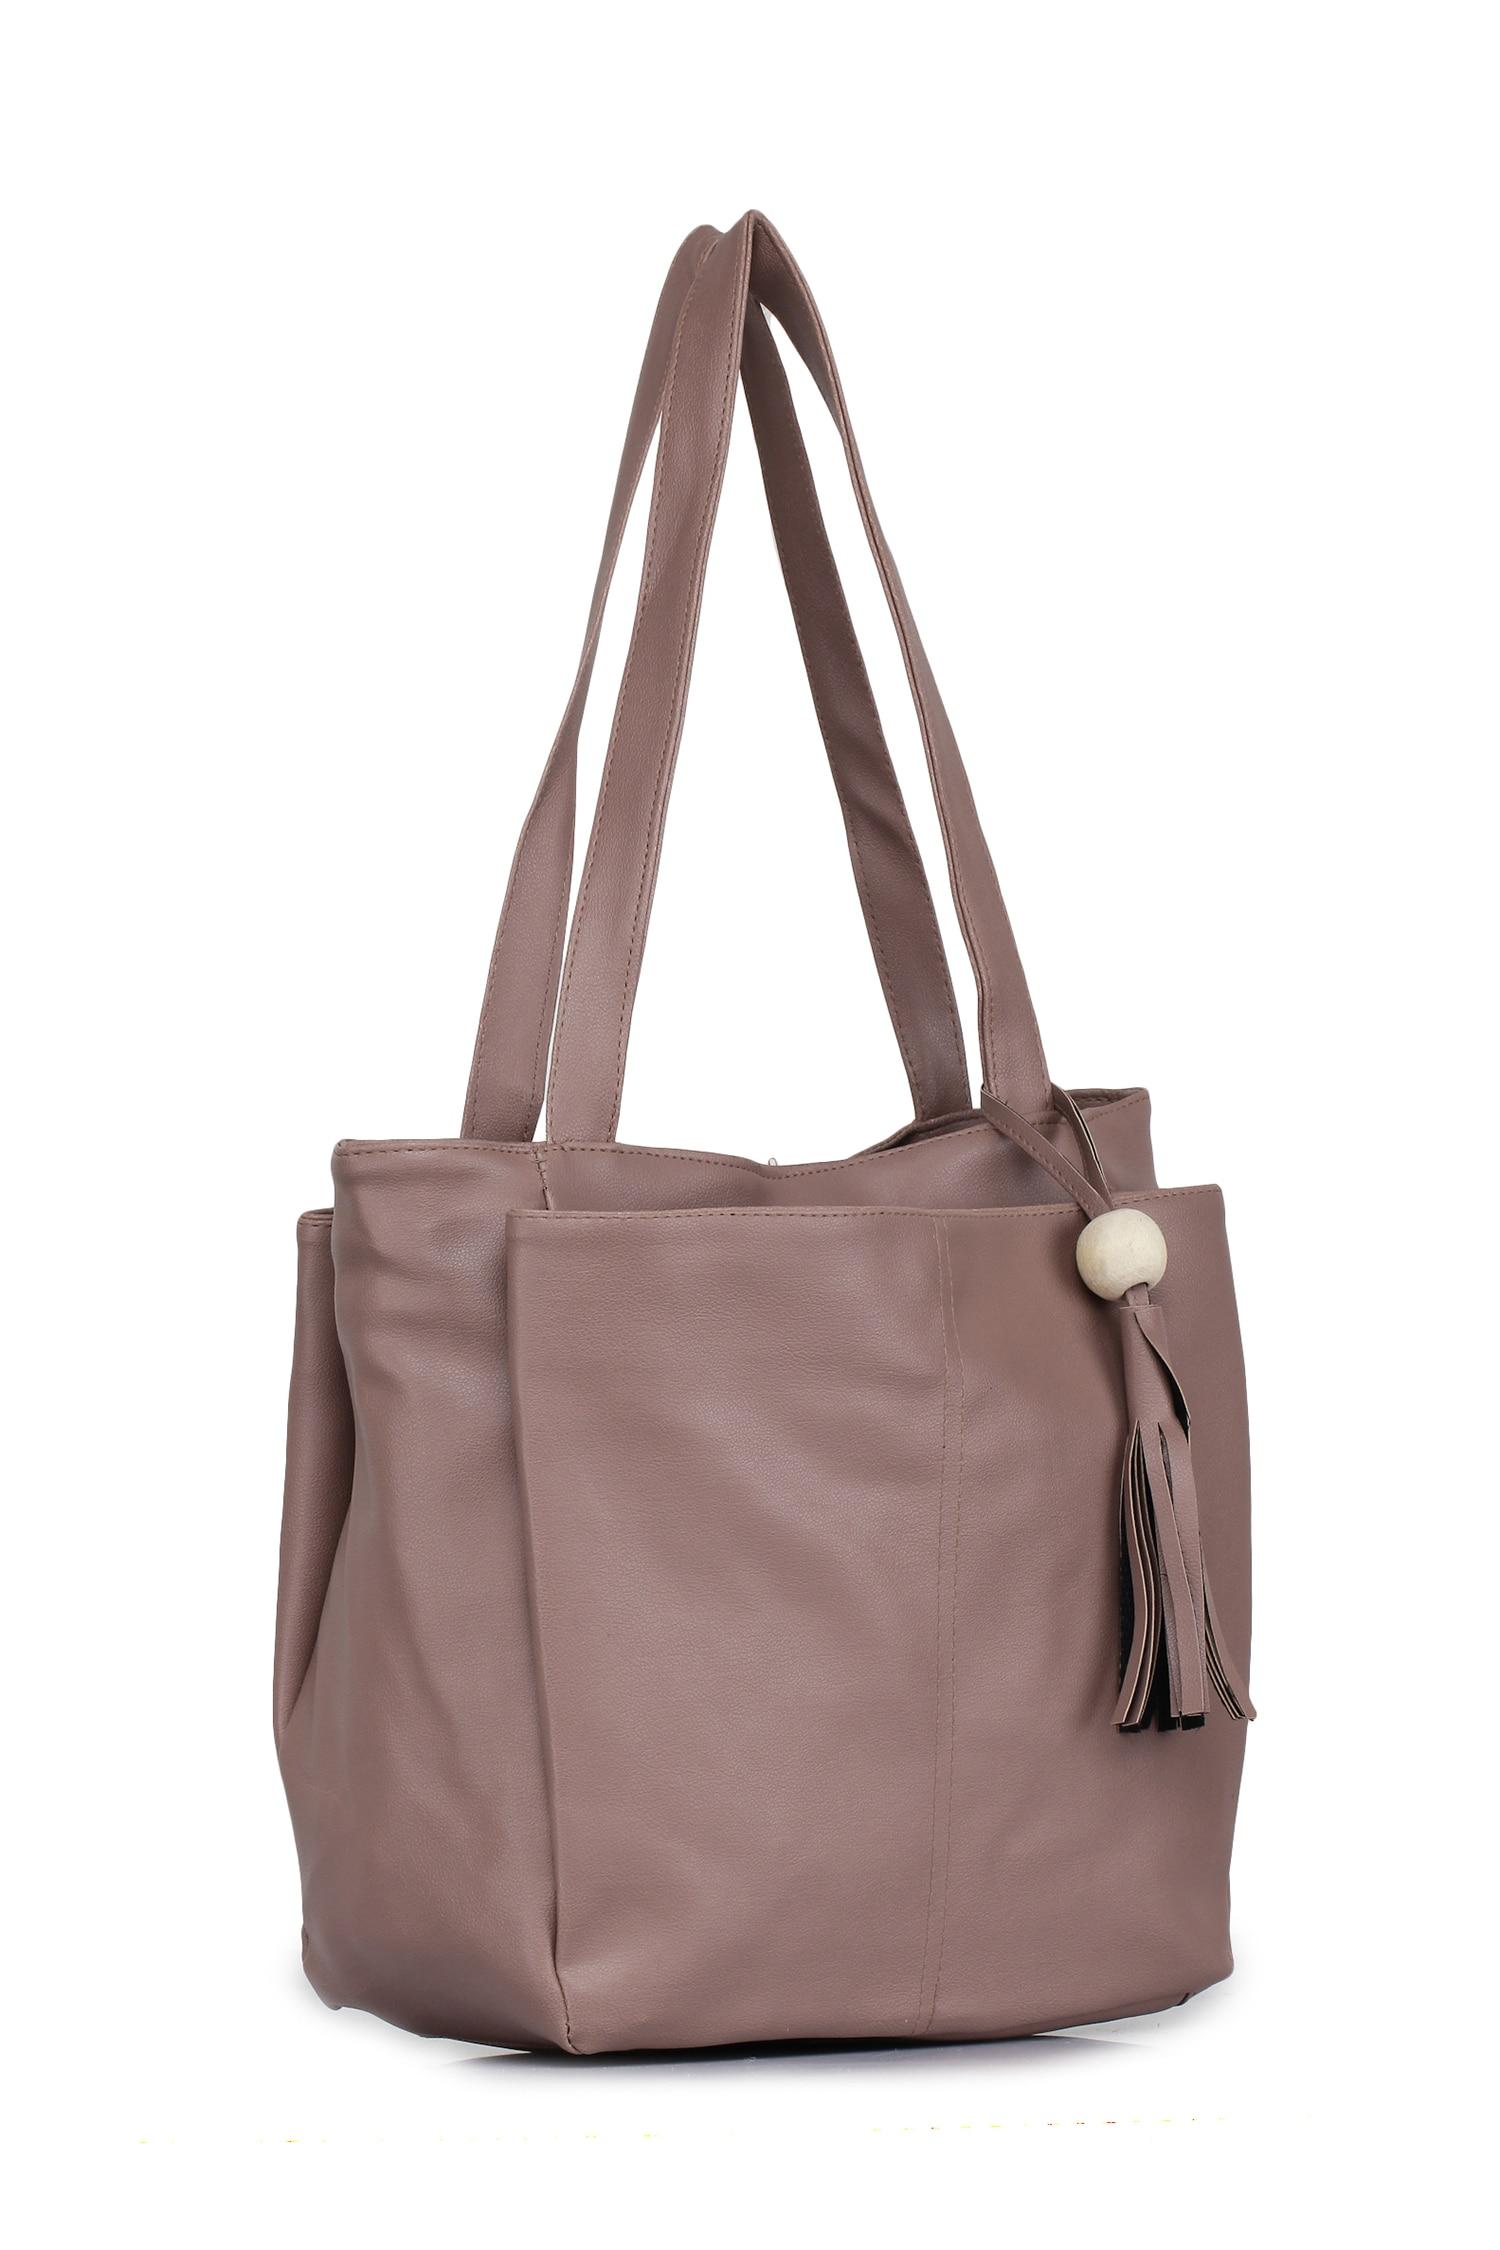 Craveforit PU Handbag For Women - Beige